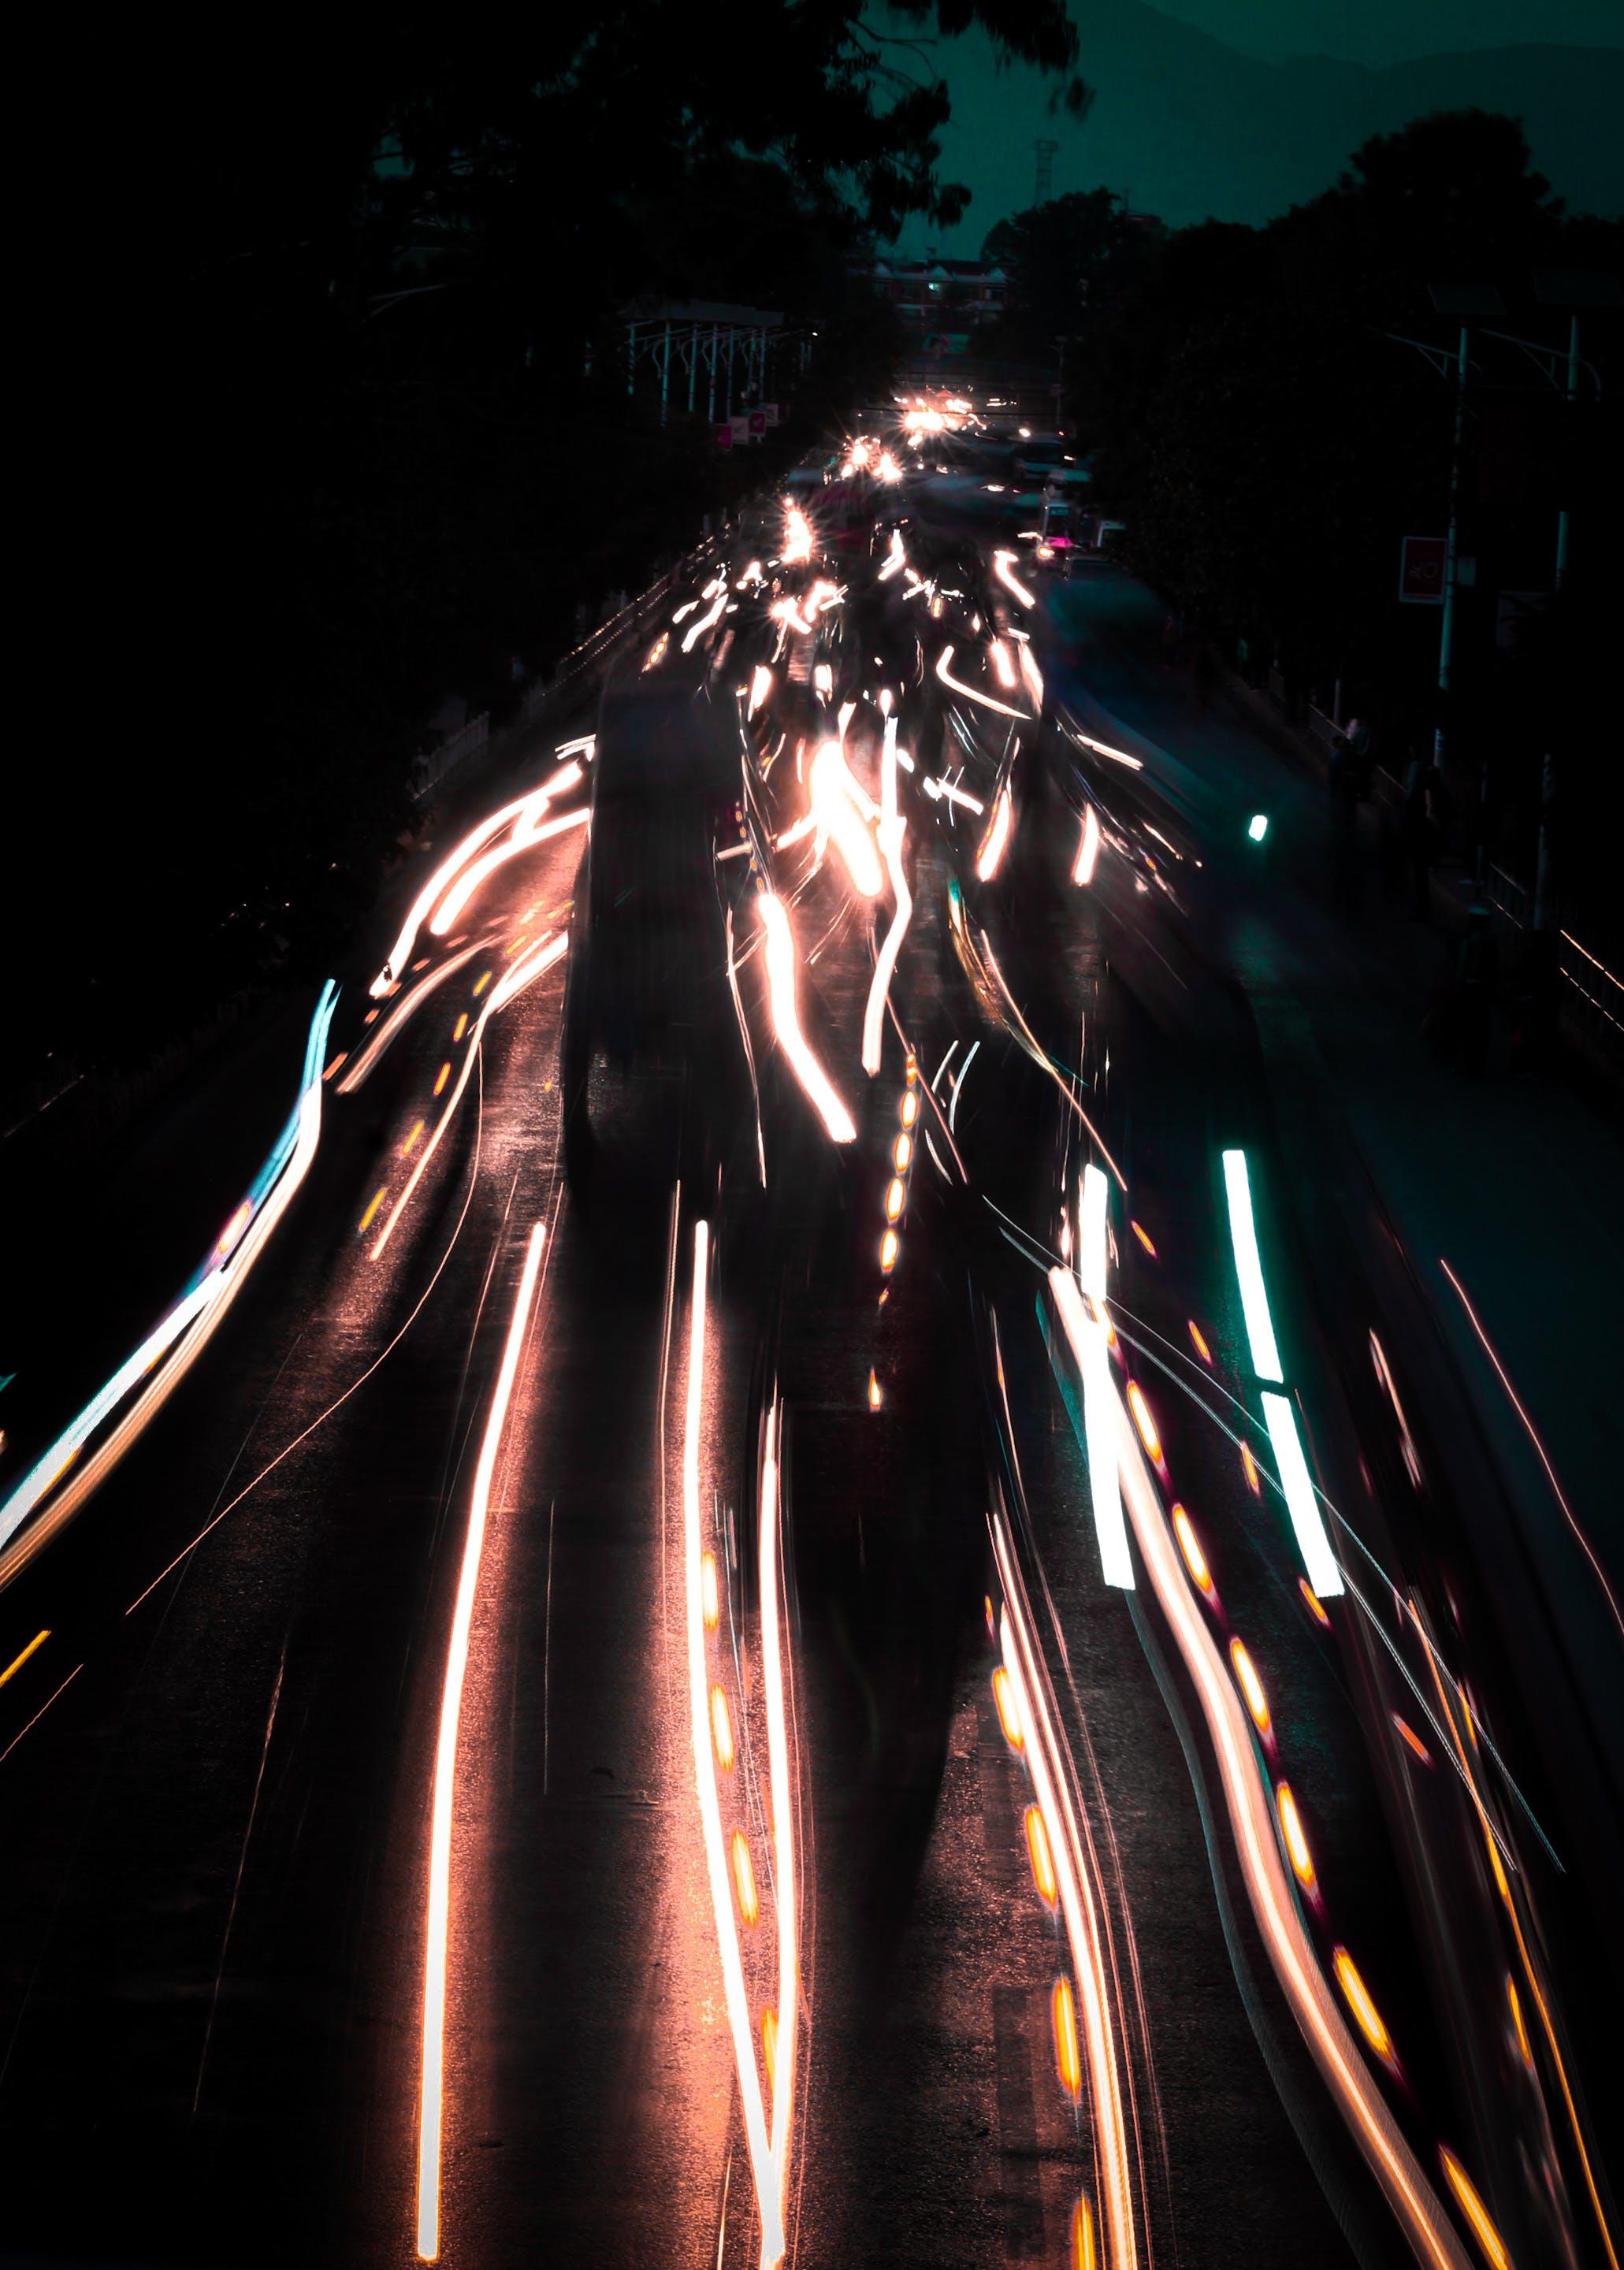 Free stock photo of cars, Light trials, lights, Lights exposure